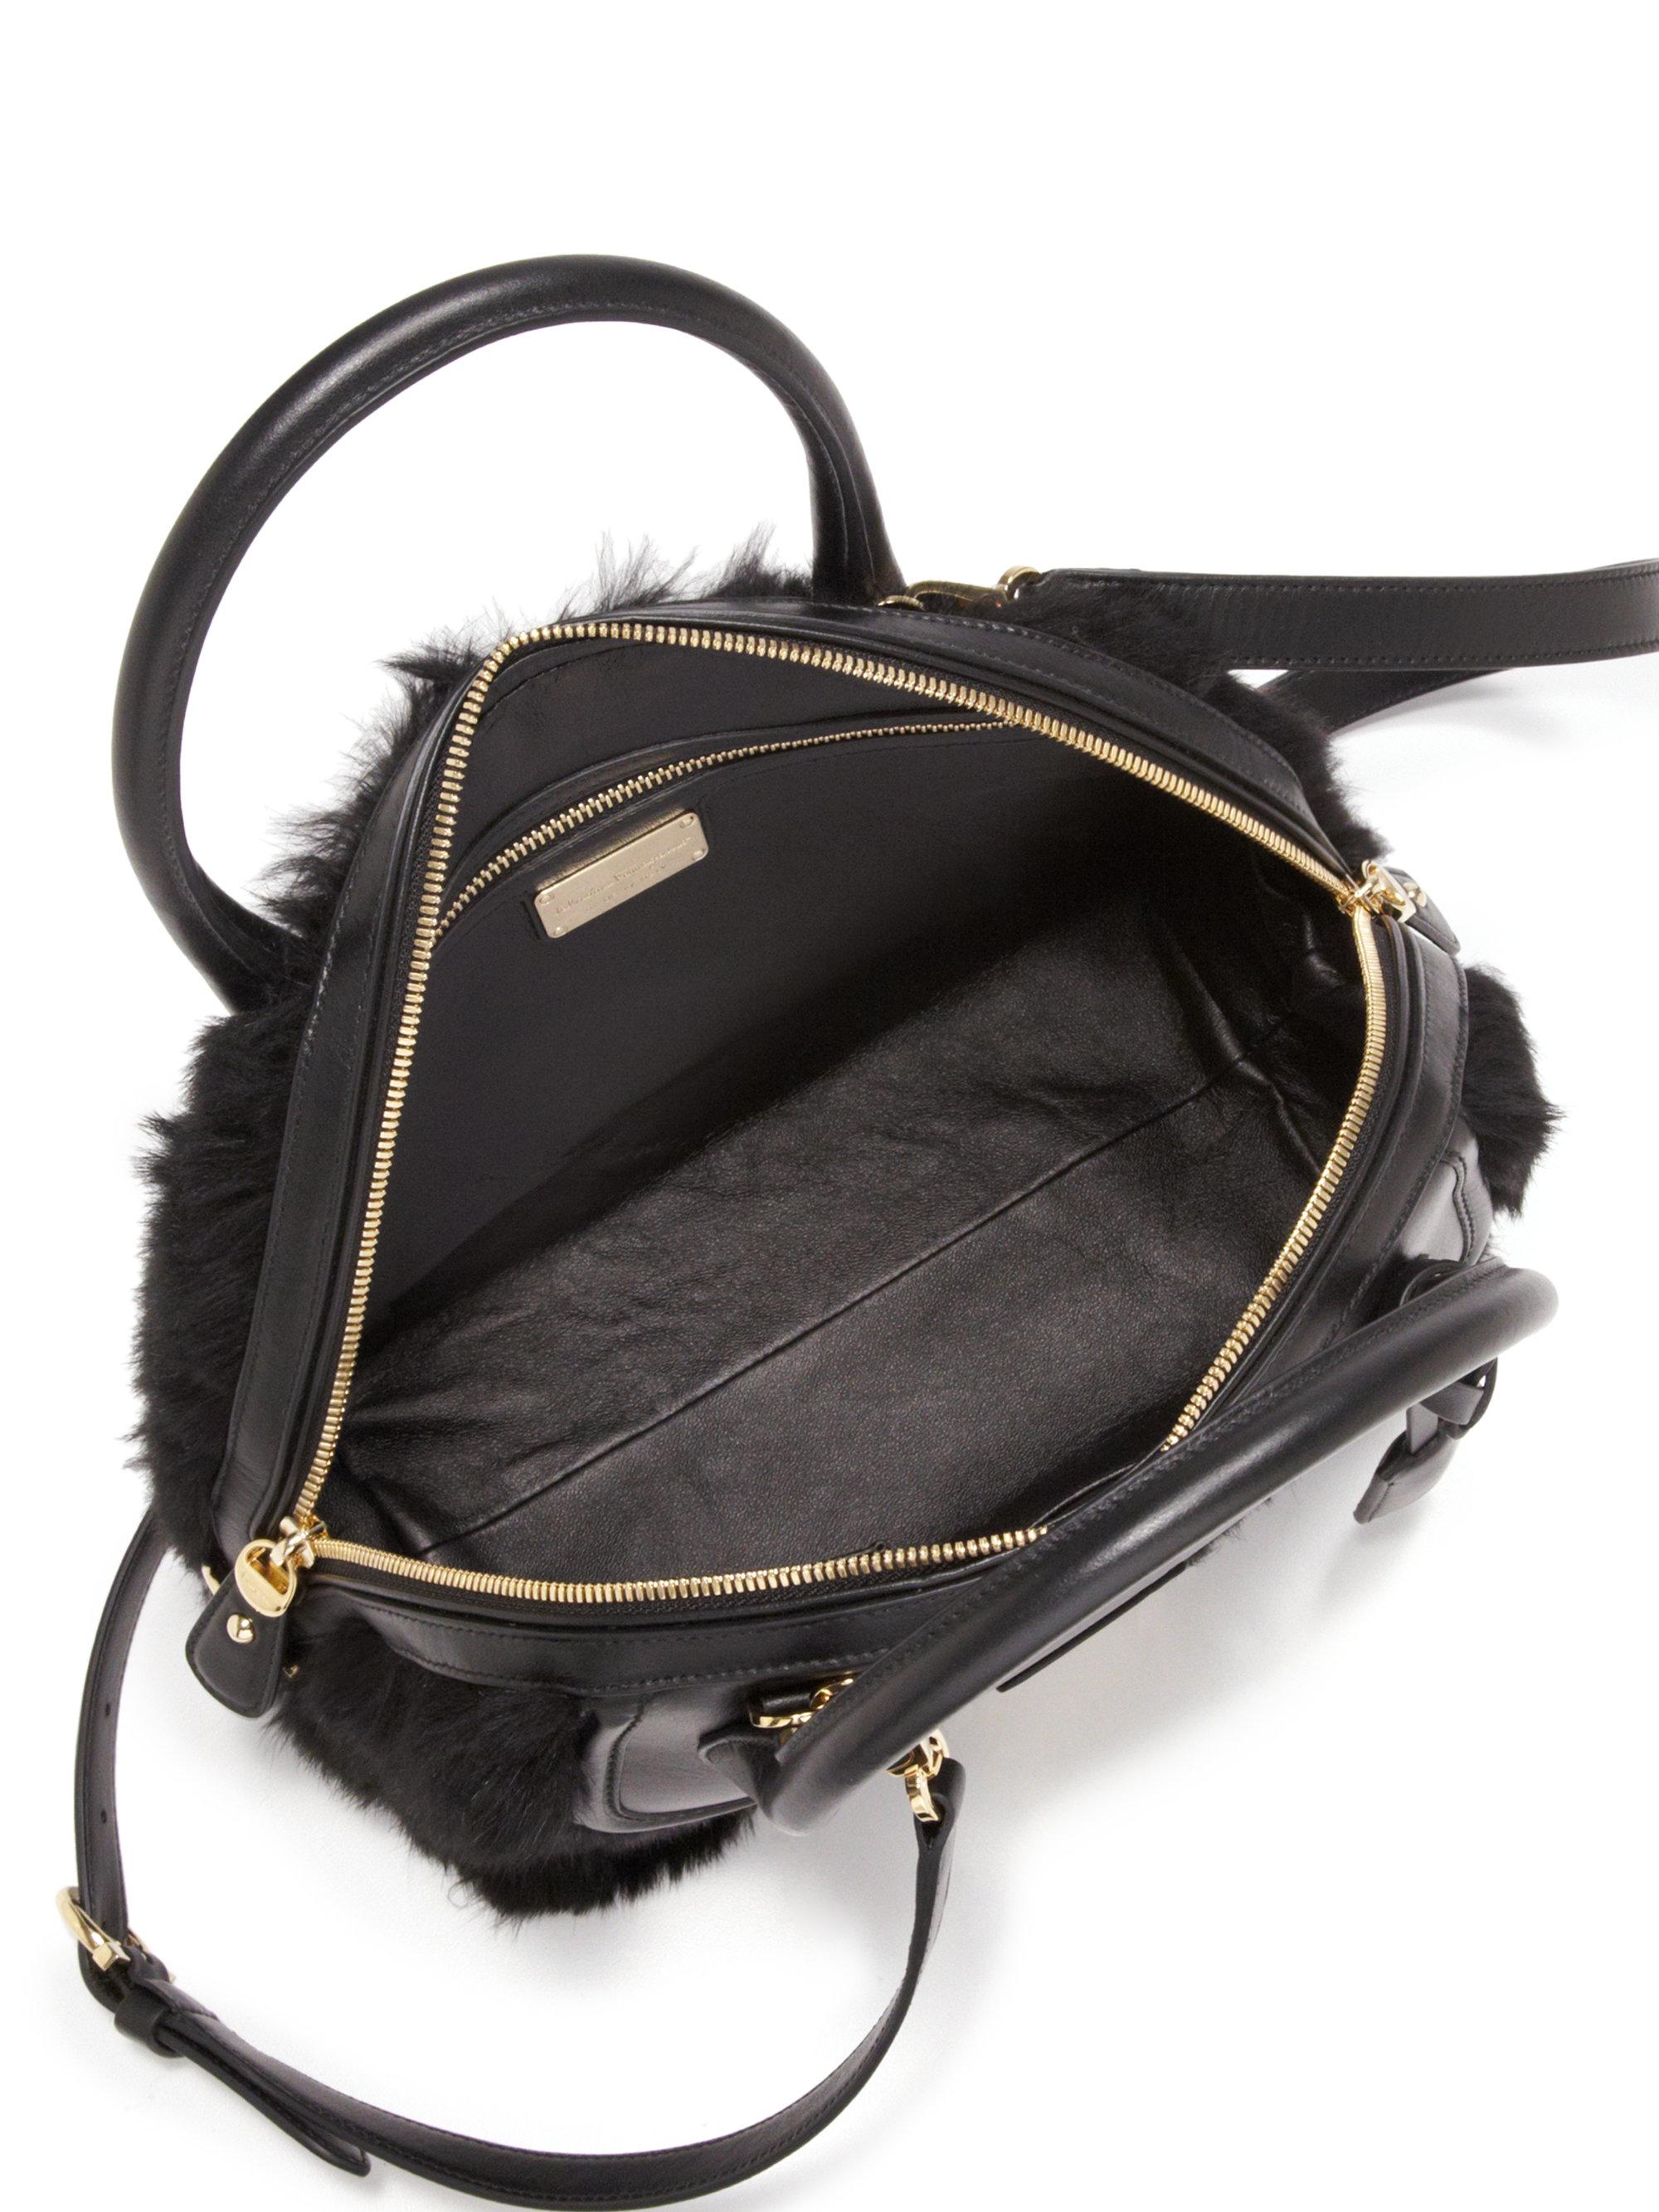 Lyst - Ferragamo Fiamma Medium Leather   Rabbit Fur Satchel in Black 4f48cc38cd641